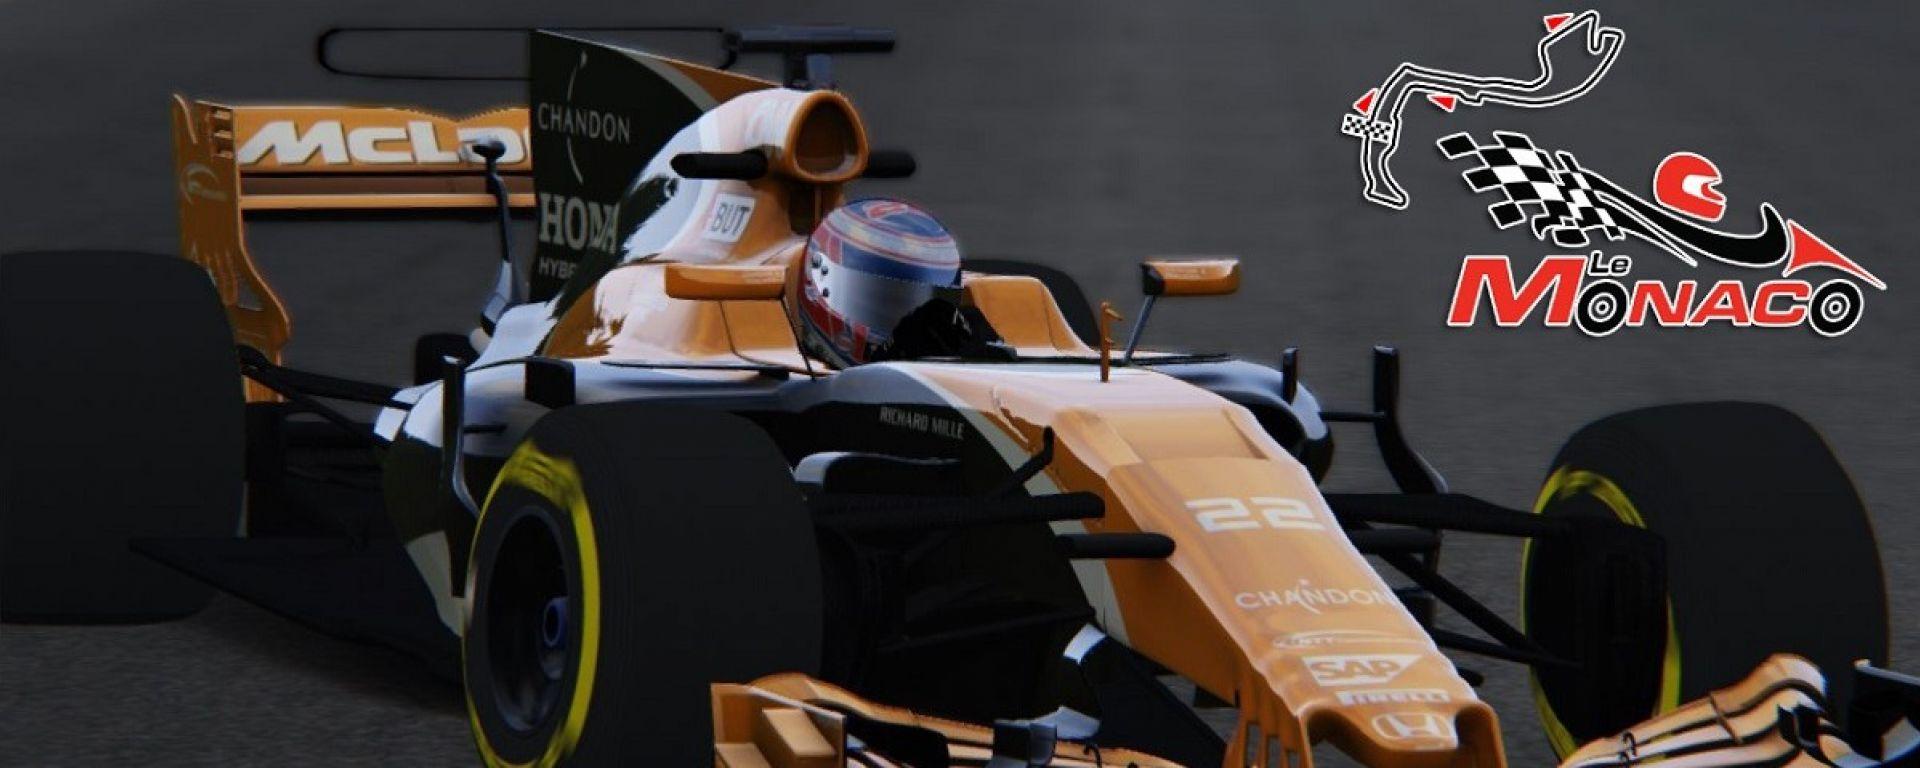 F1 2017 GP Monaco, Jenson Button